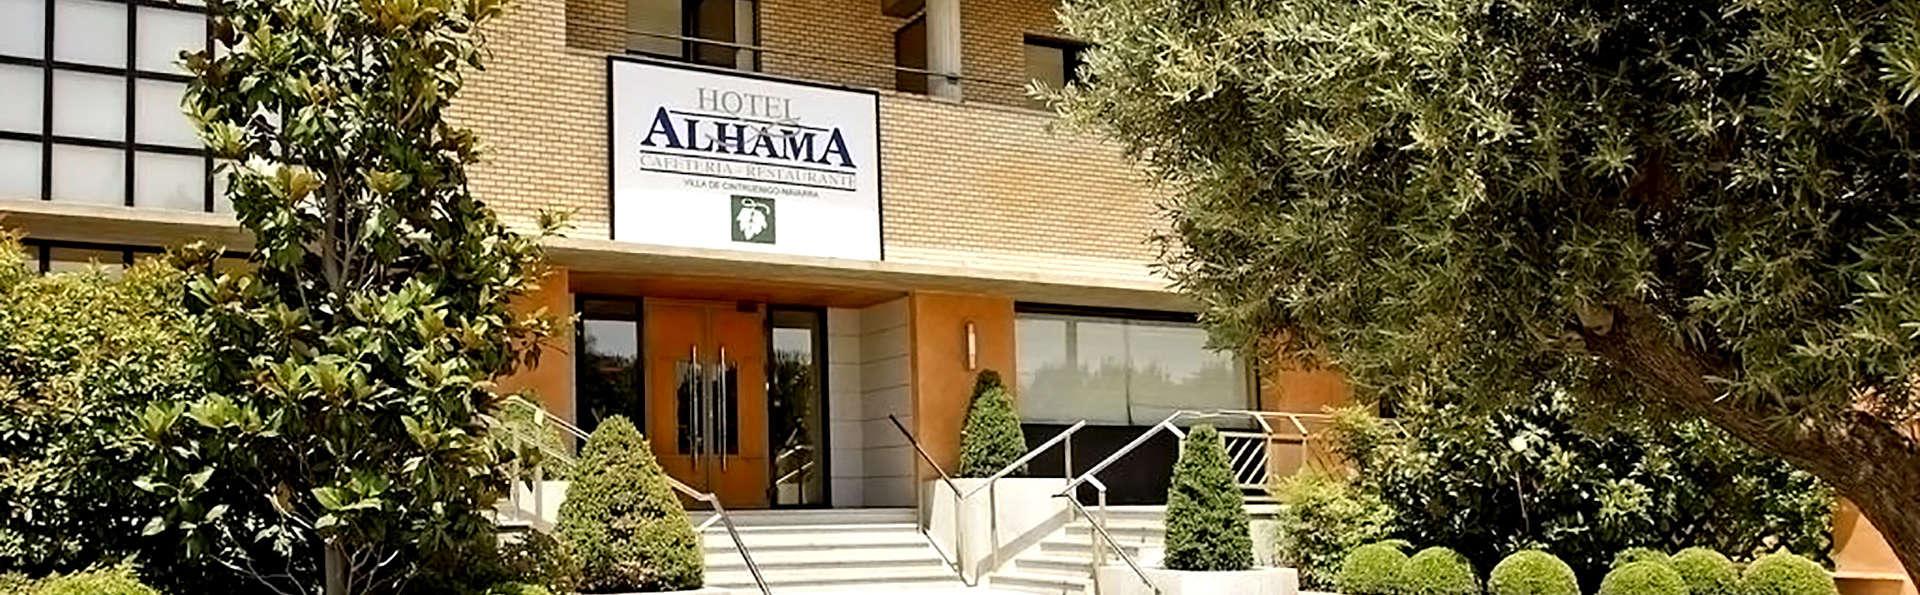 Hotel Alhama - Edit_Front.jpg